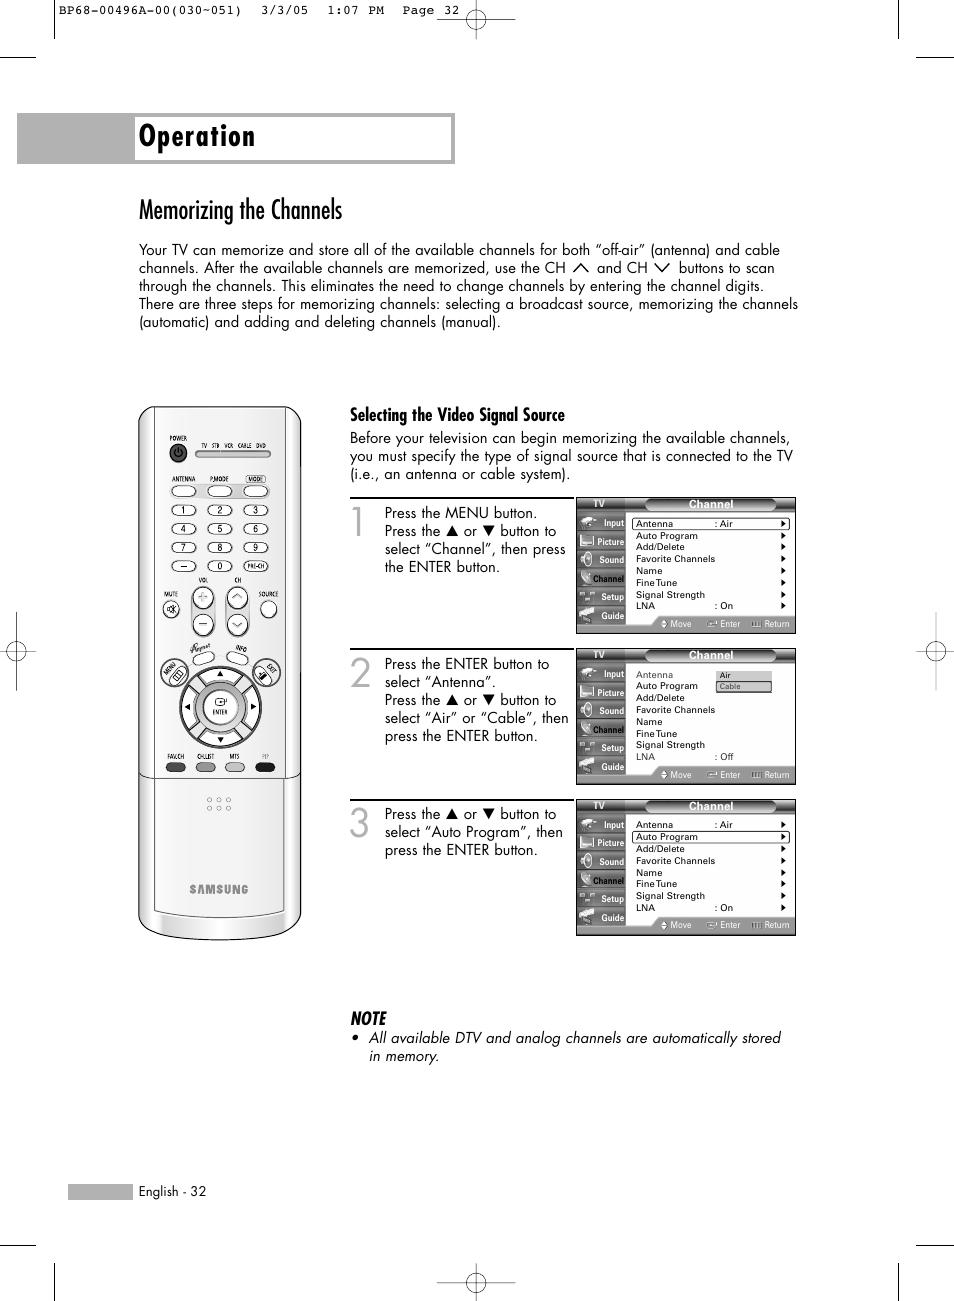 memorizing the channels operation selecting the video signal rh manualsdir com